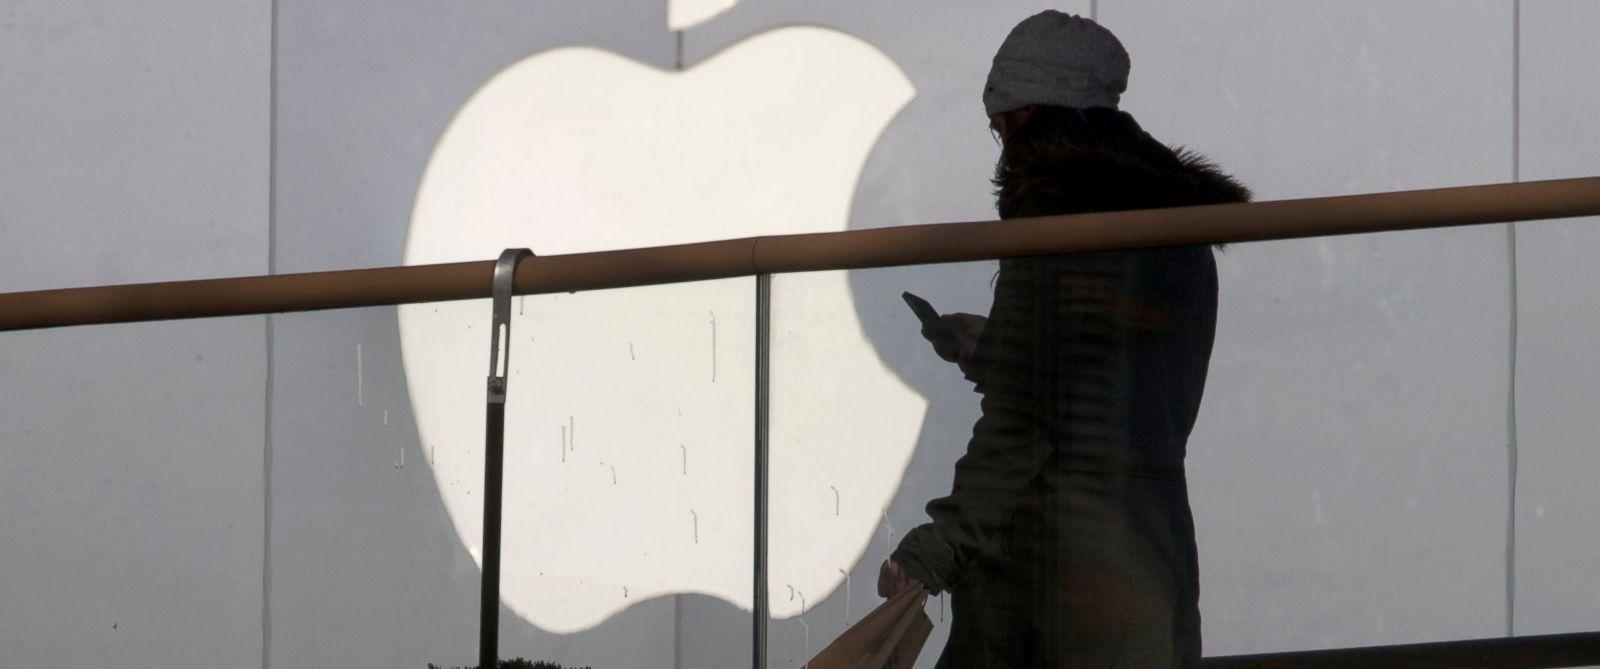 PHOTO: A woman walks past Apples logo.